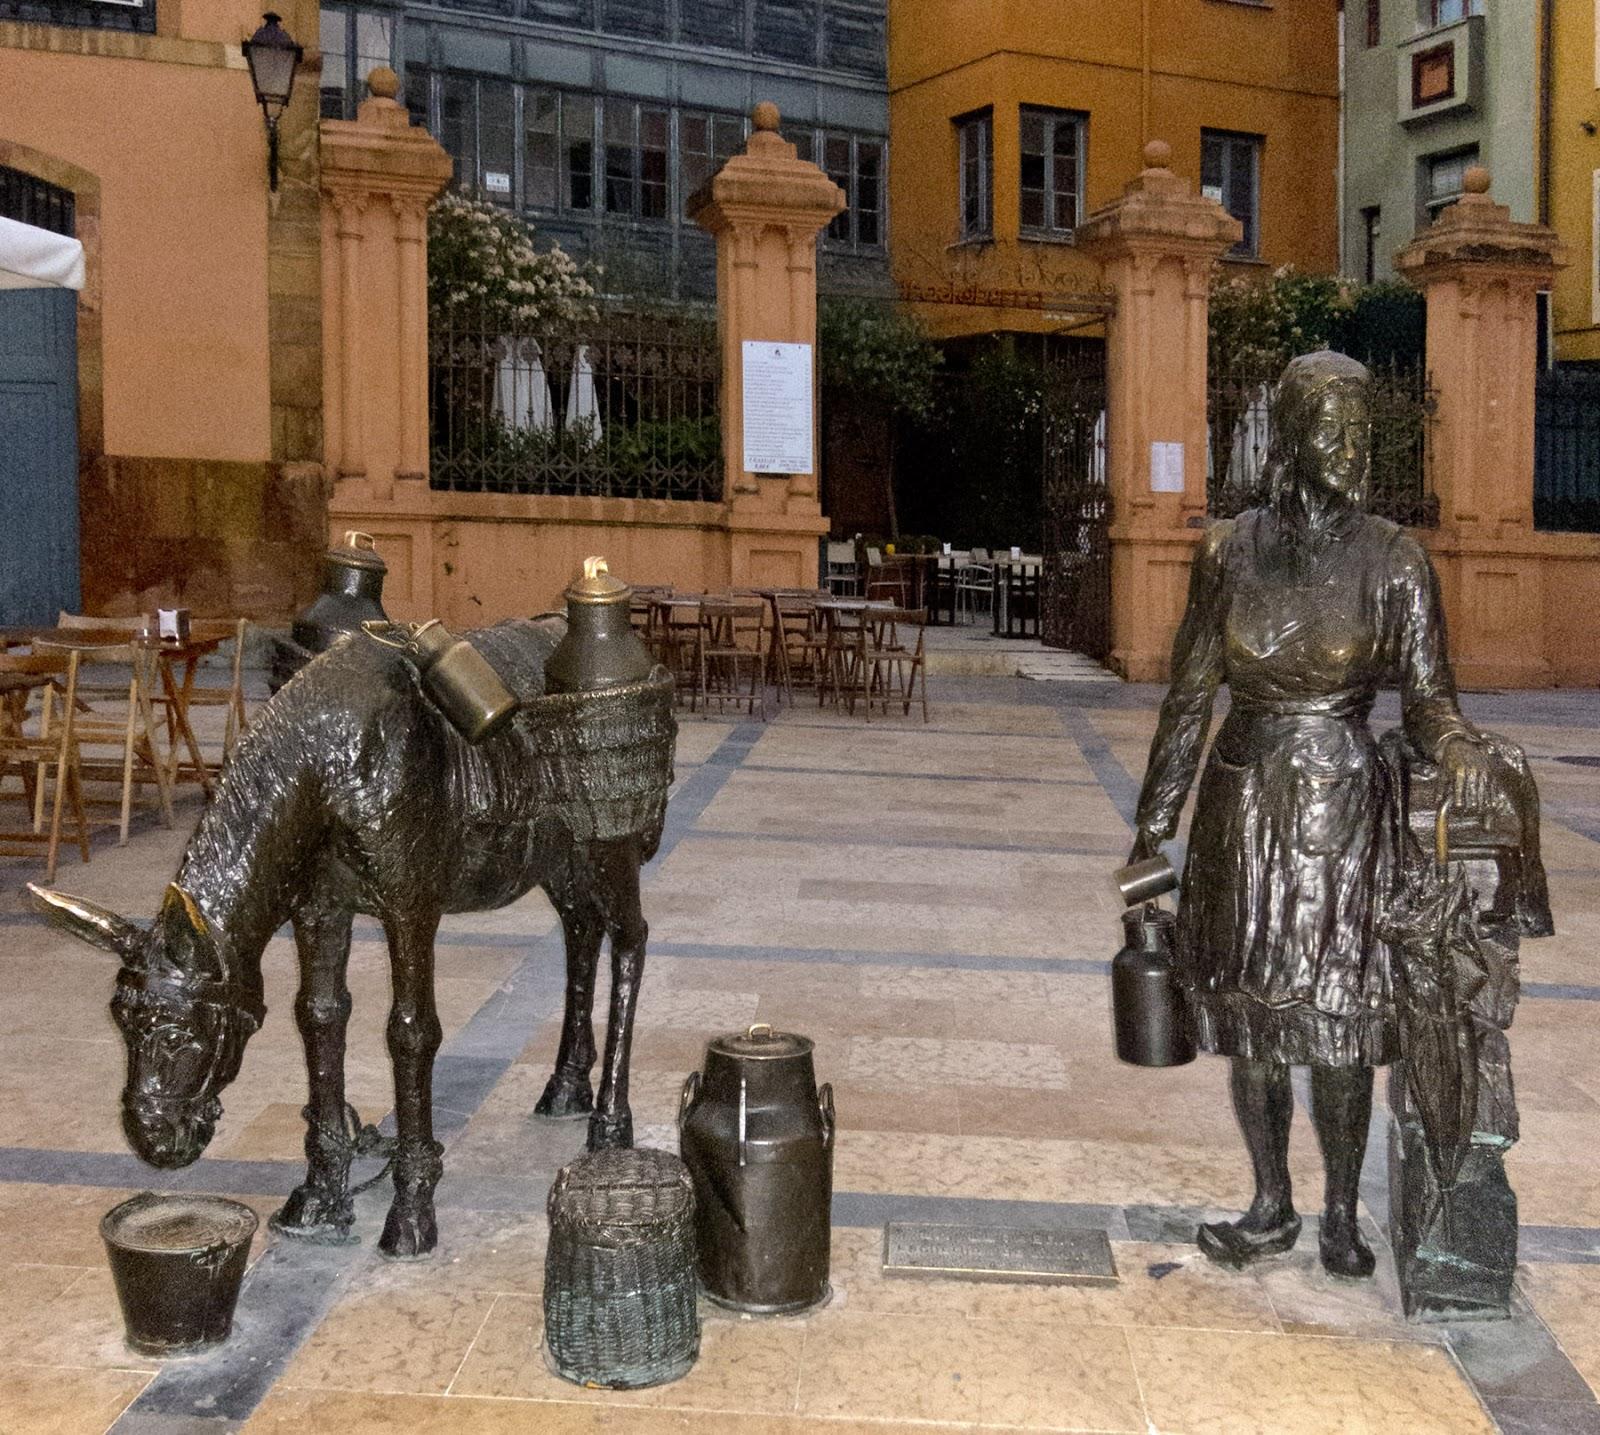 La lechera, Trascorrales, Oviedo